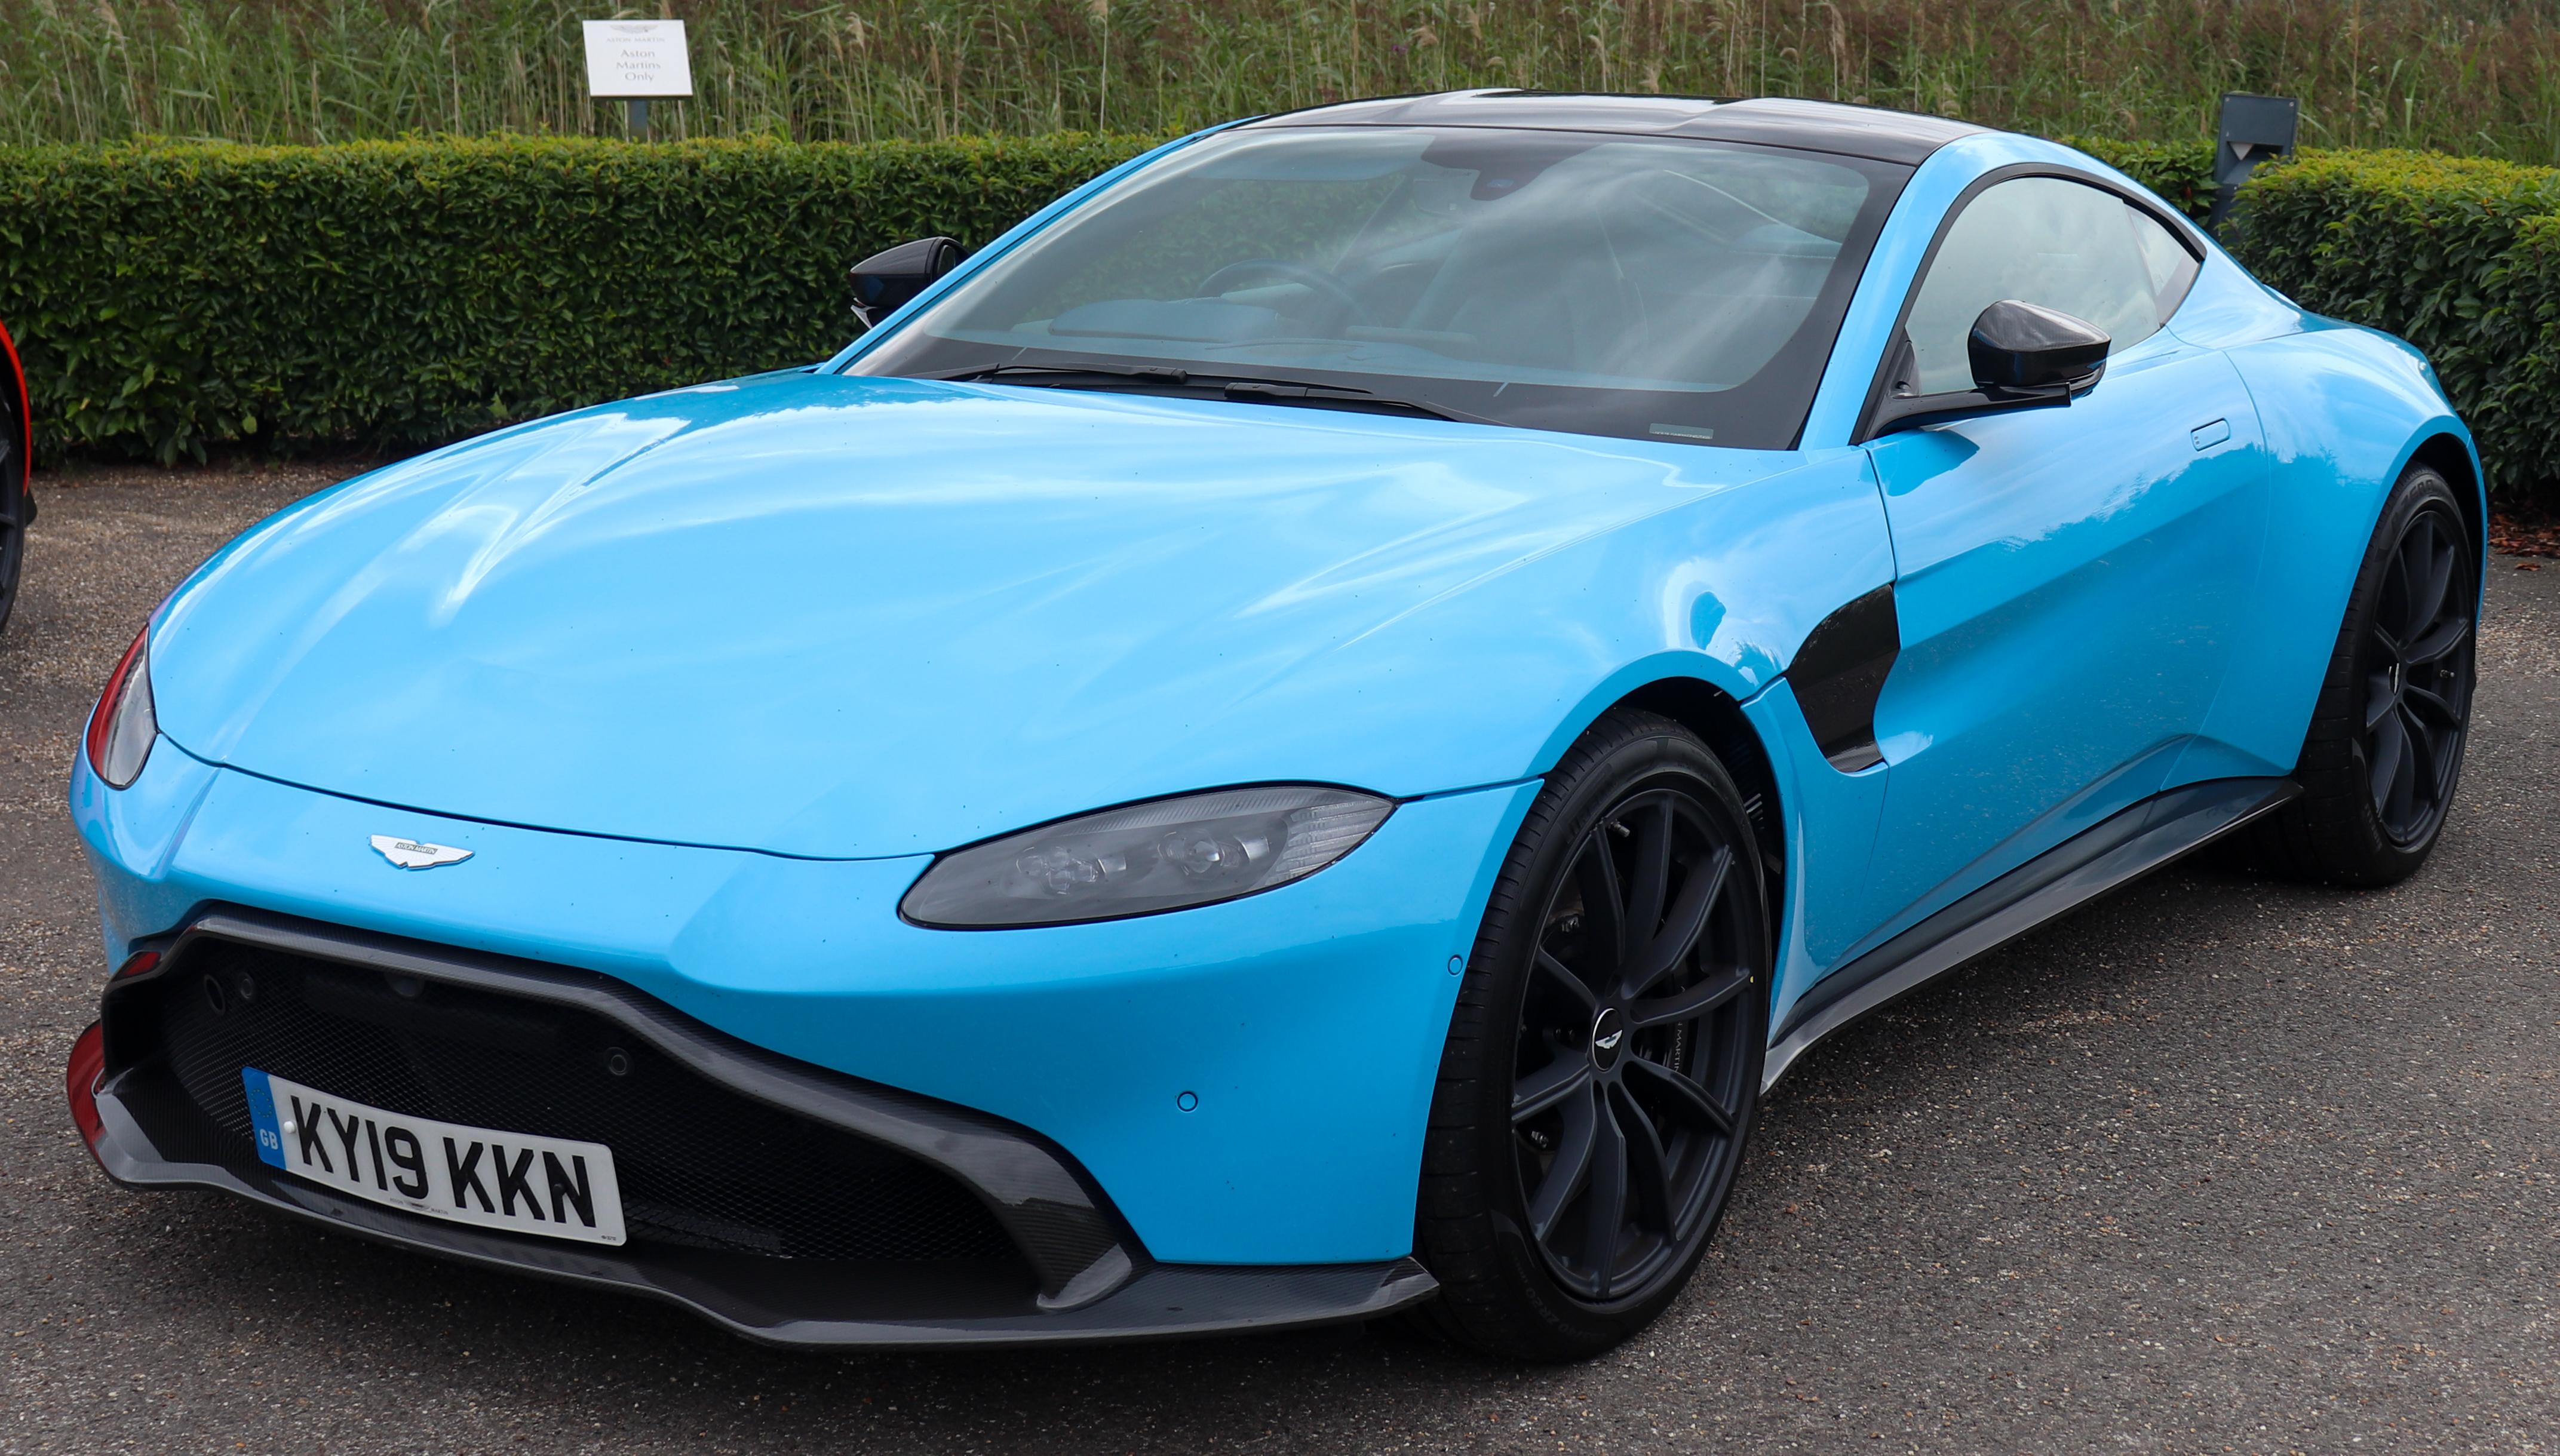 File 2019 Aston Martin Vantage V8 Automatic 4 0 Front Jpg Wikimedia Commons